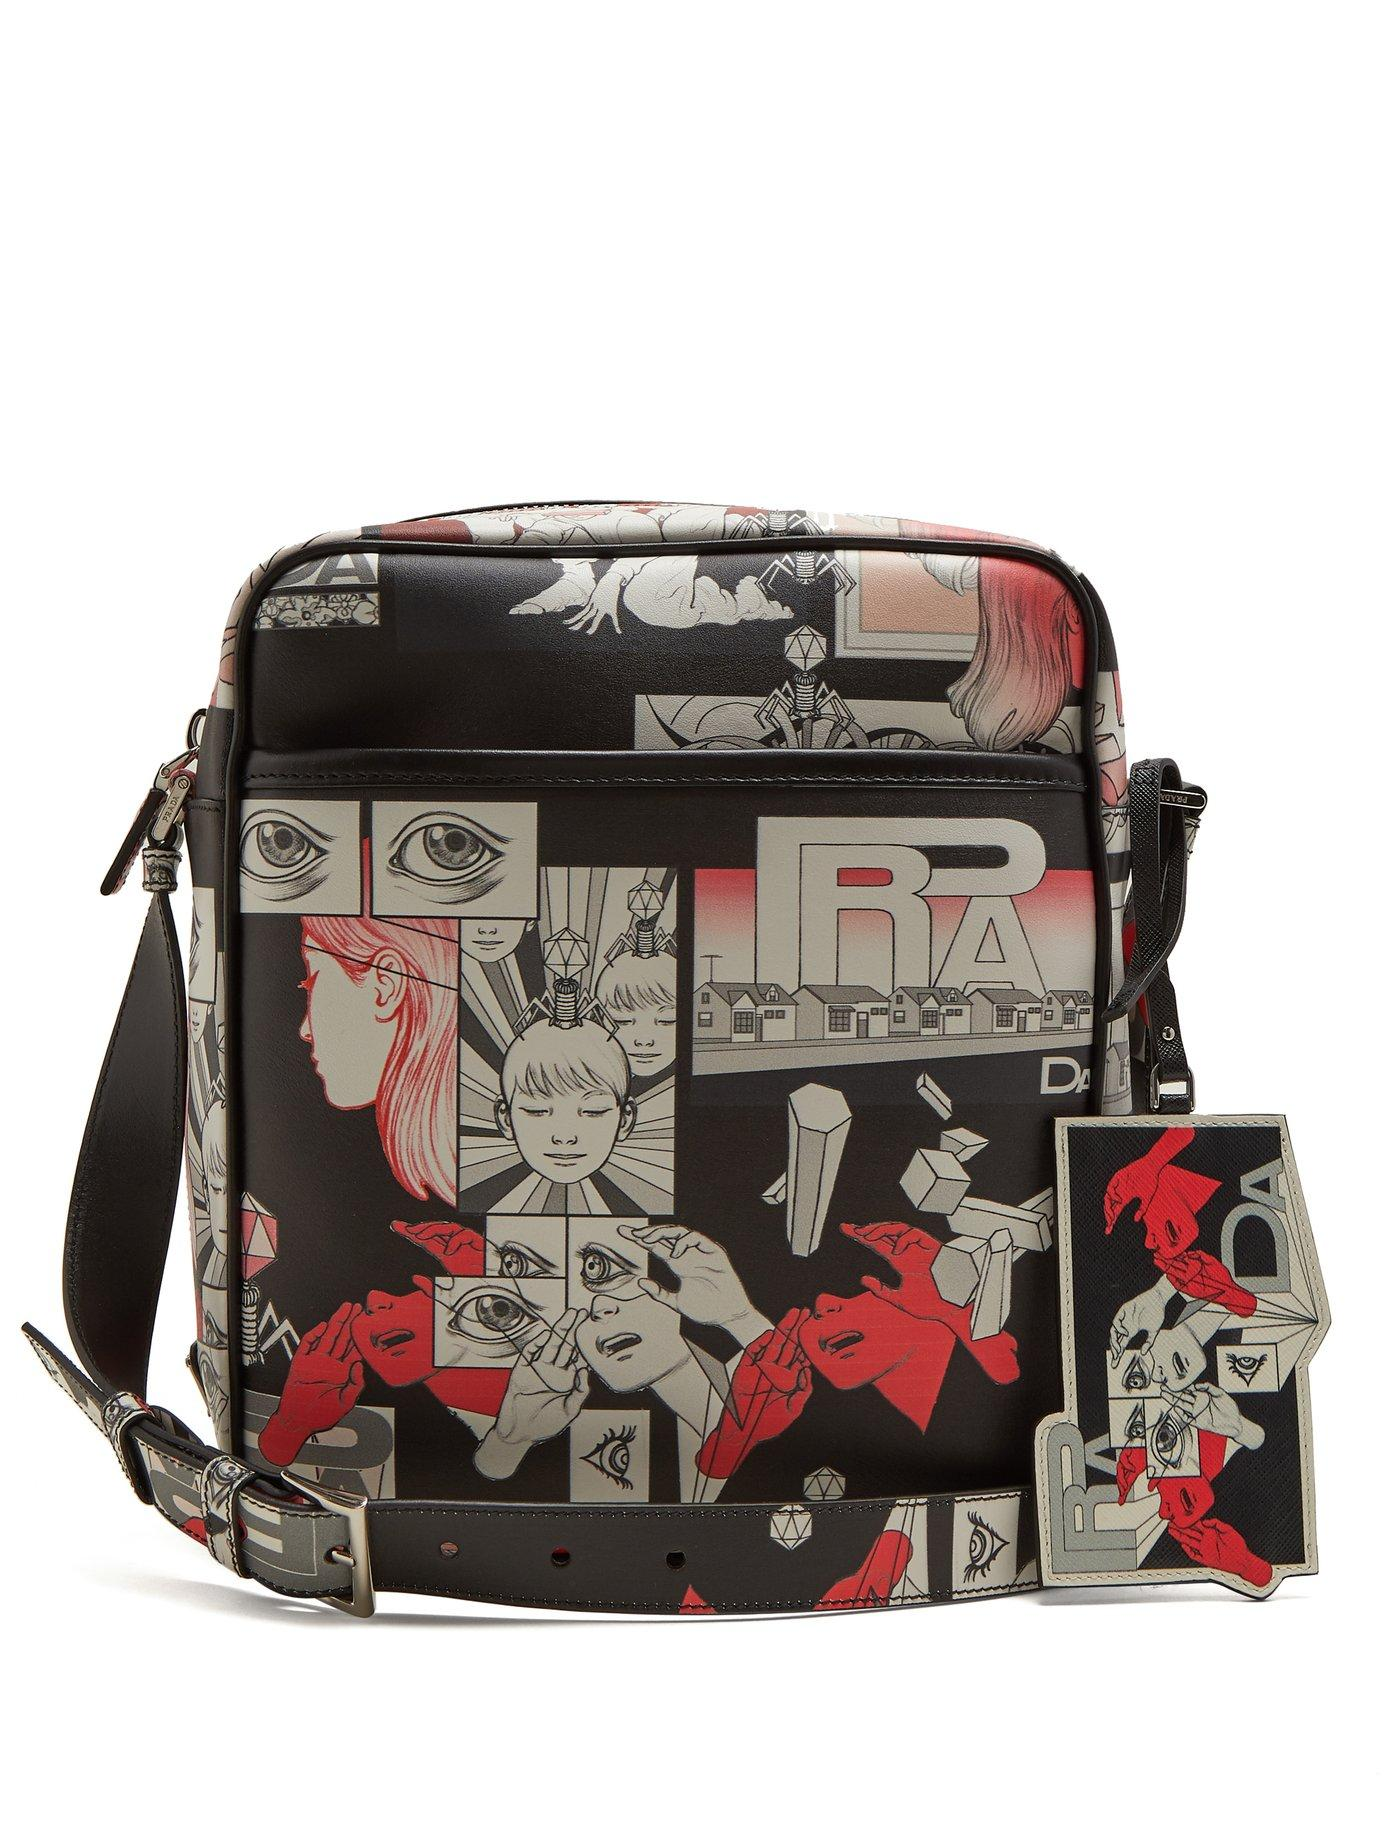 Prada Comic-strip Print Leather Messenger Bag In Black Multi